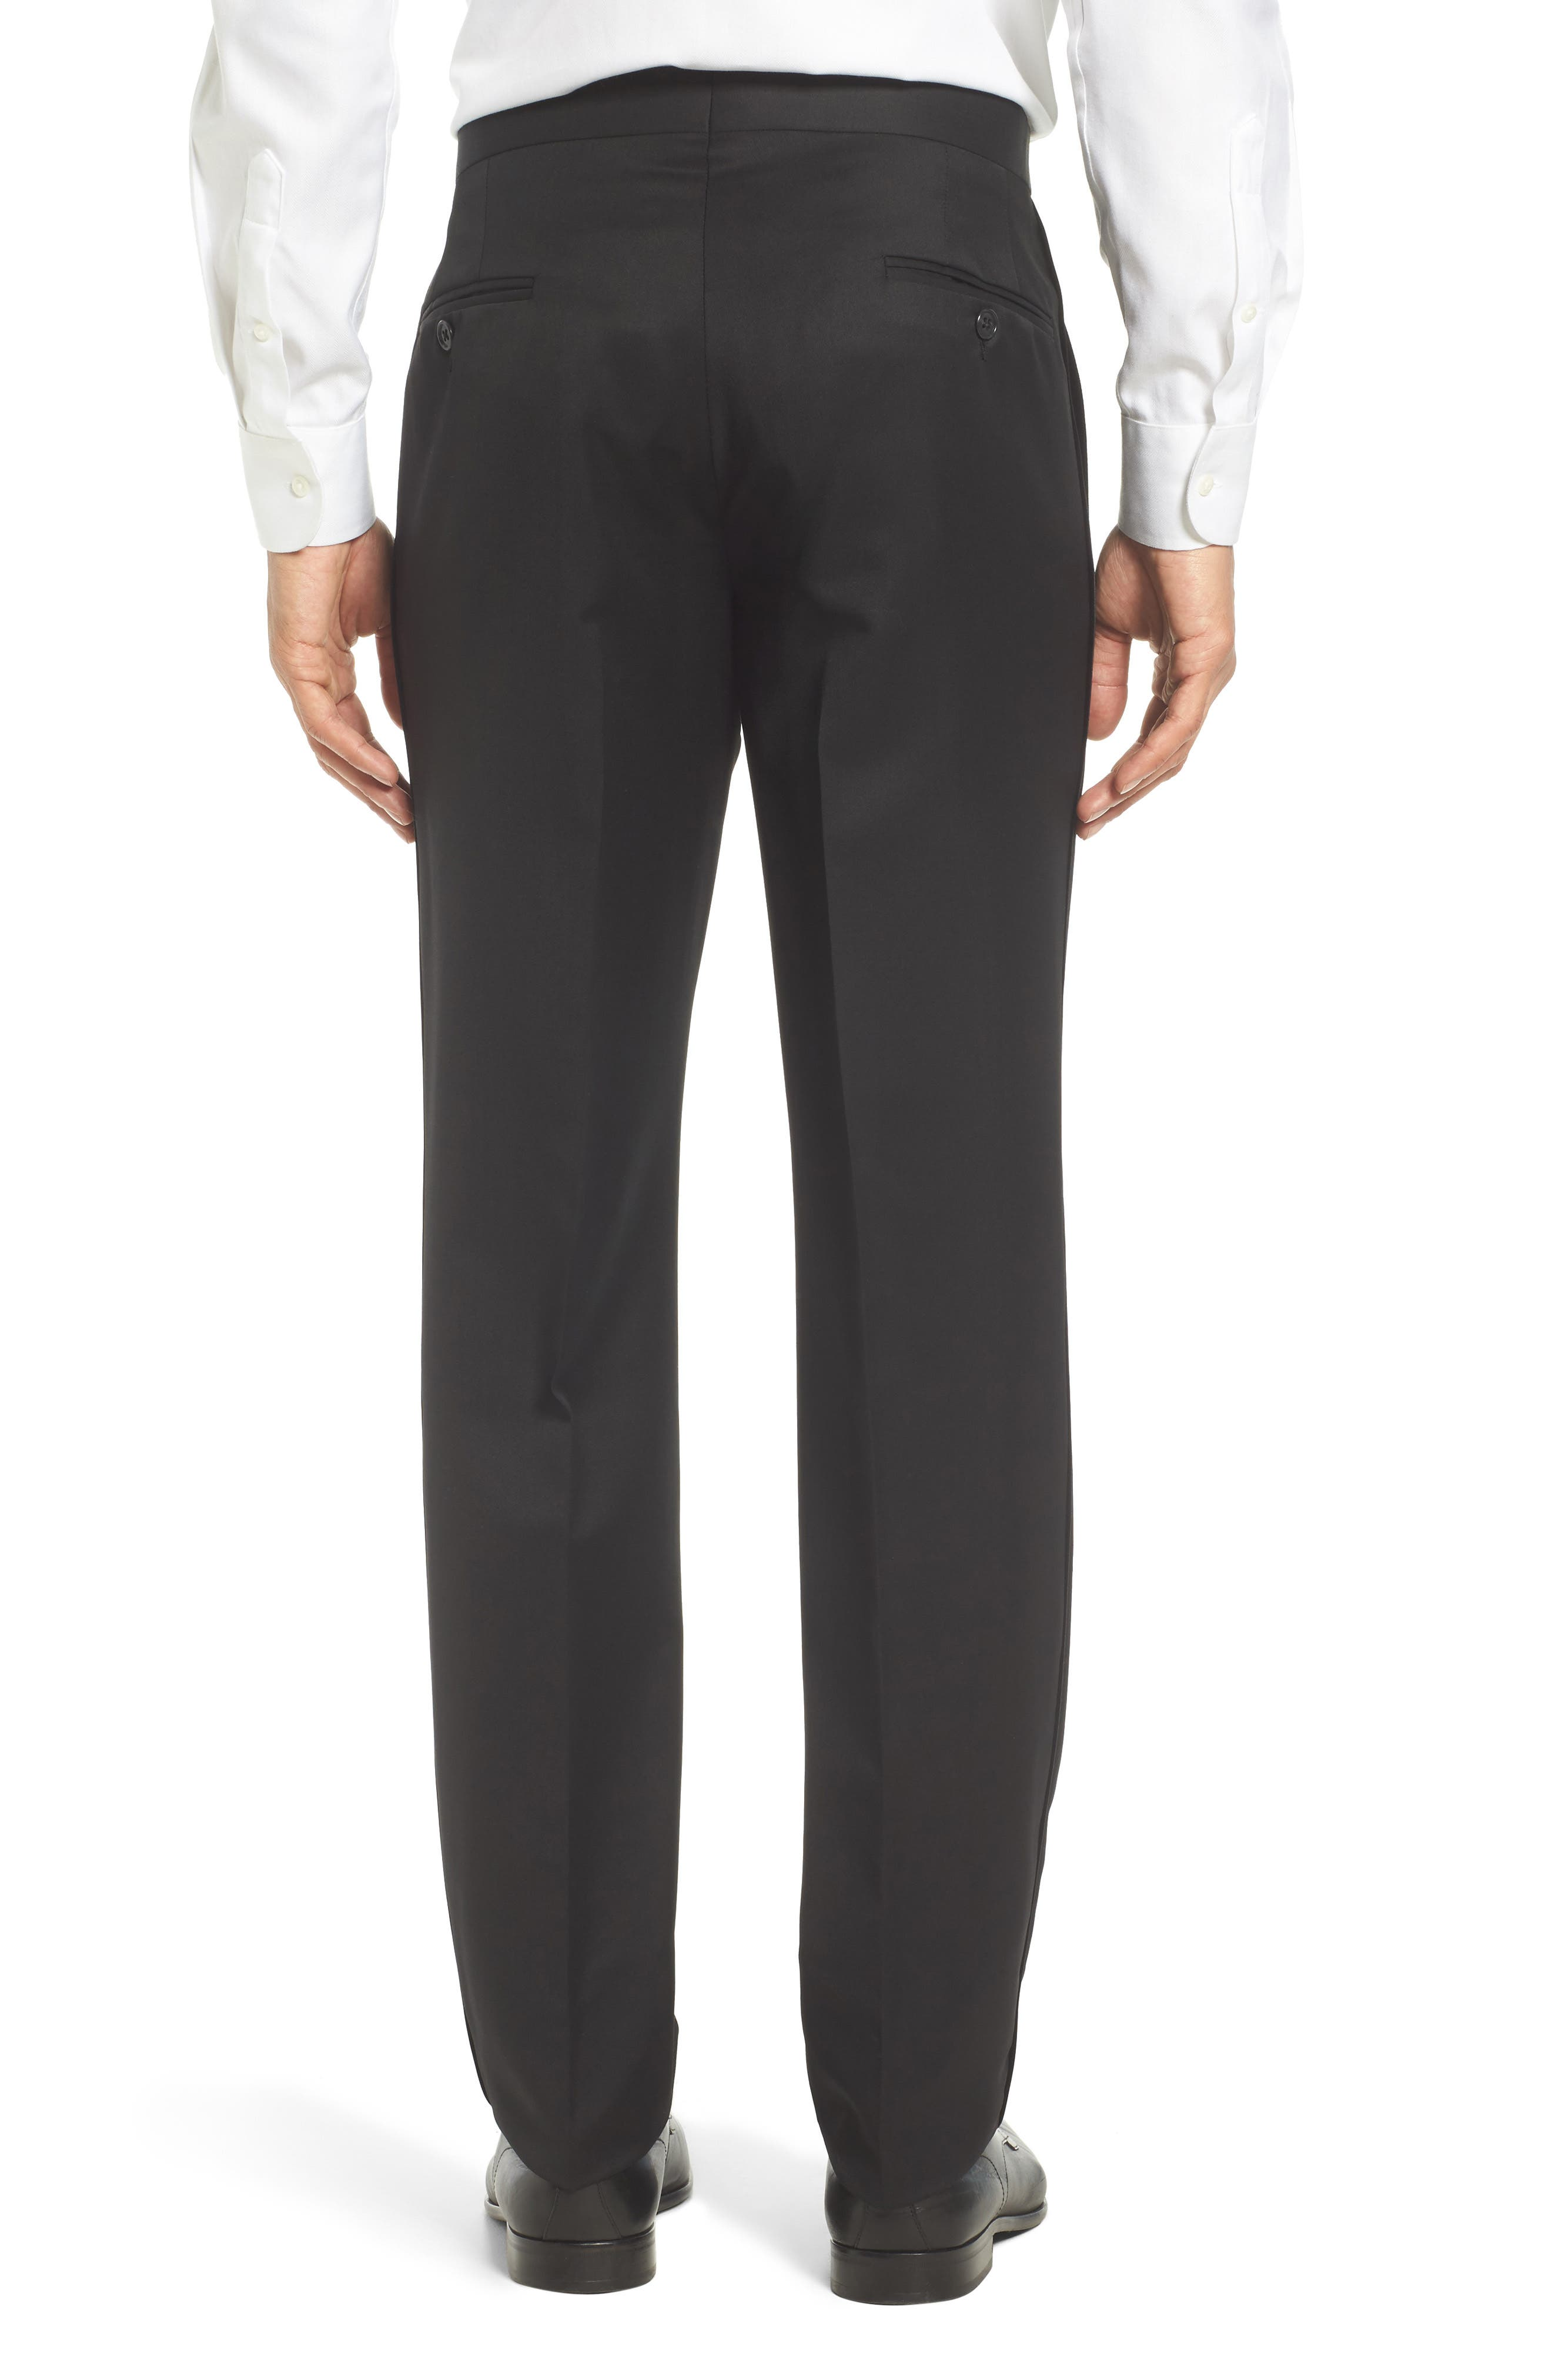 Josh Flat Front Wool & Mohair Tuxedo Pants,                             Alternate thumbnail 3, color,                             BLACK